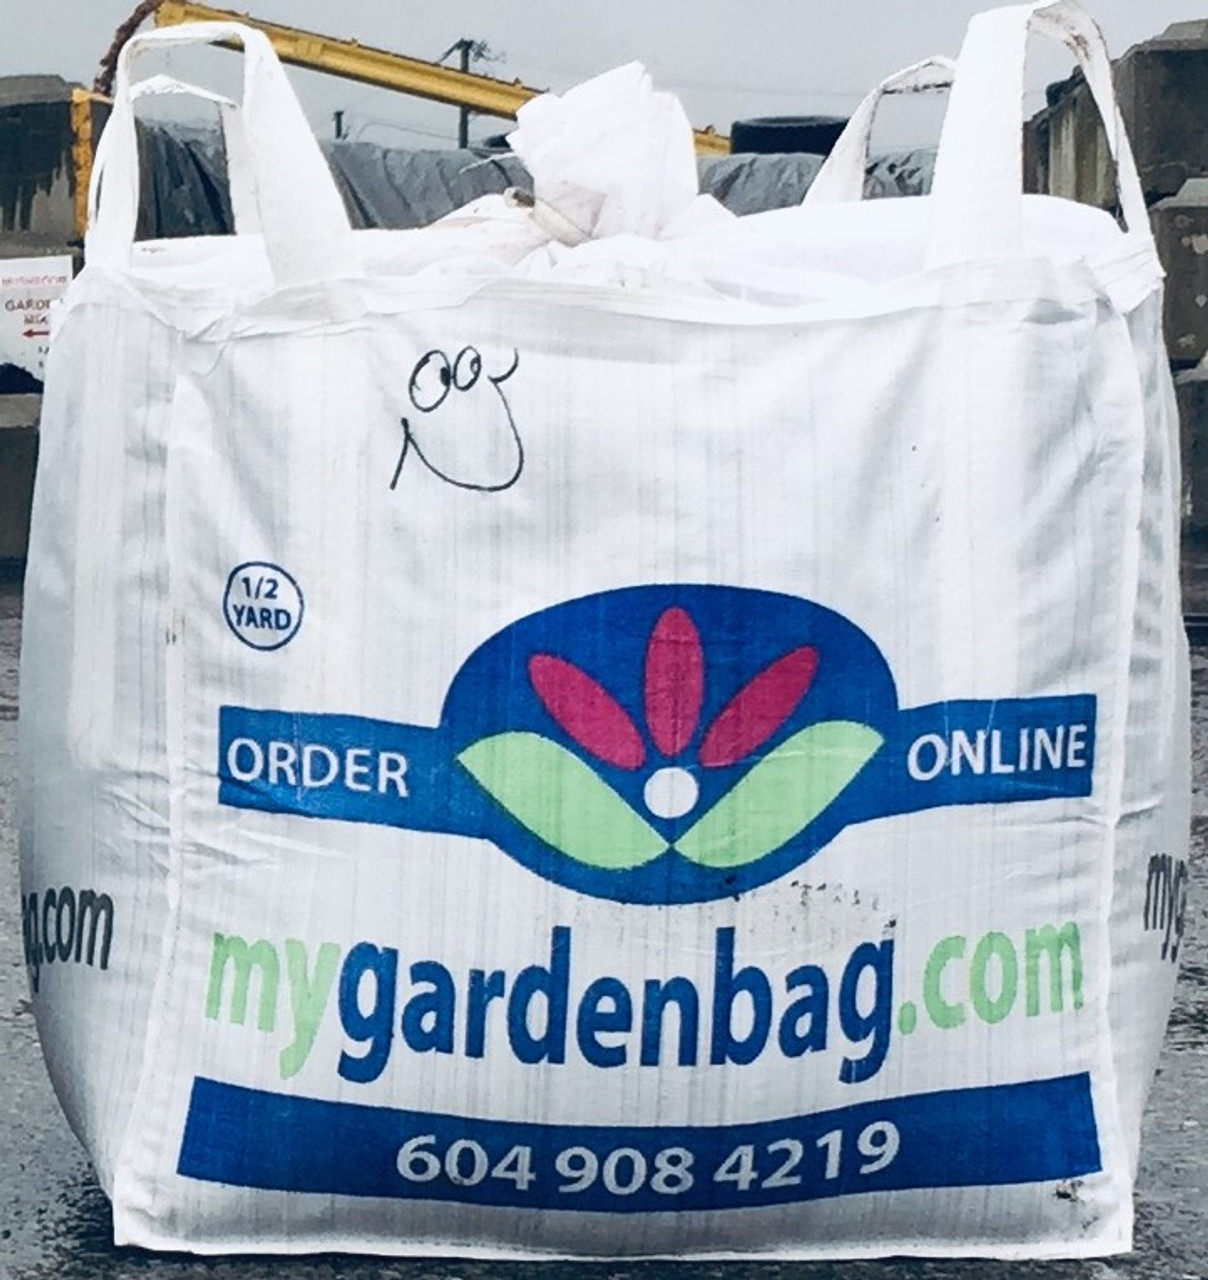 1/2 yard bag of C-33 Sand